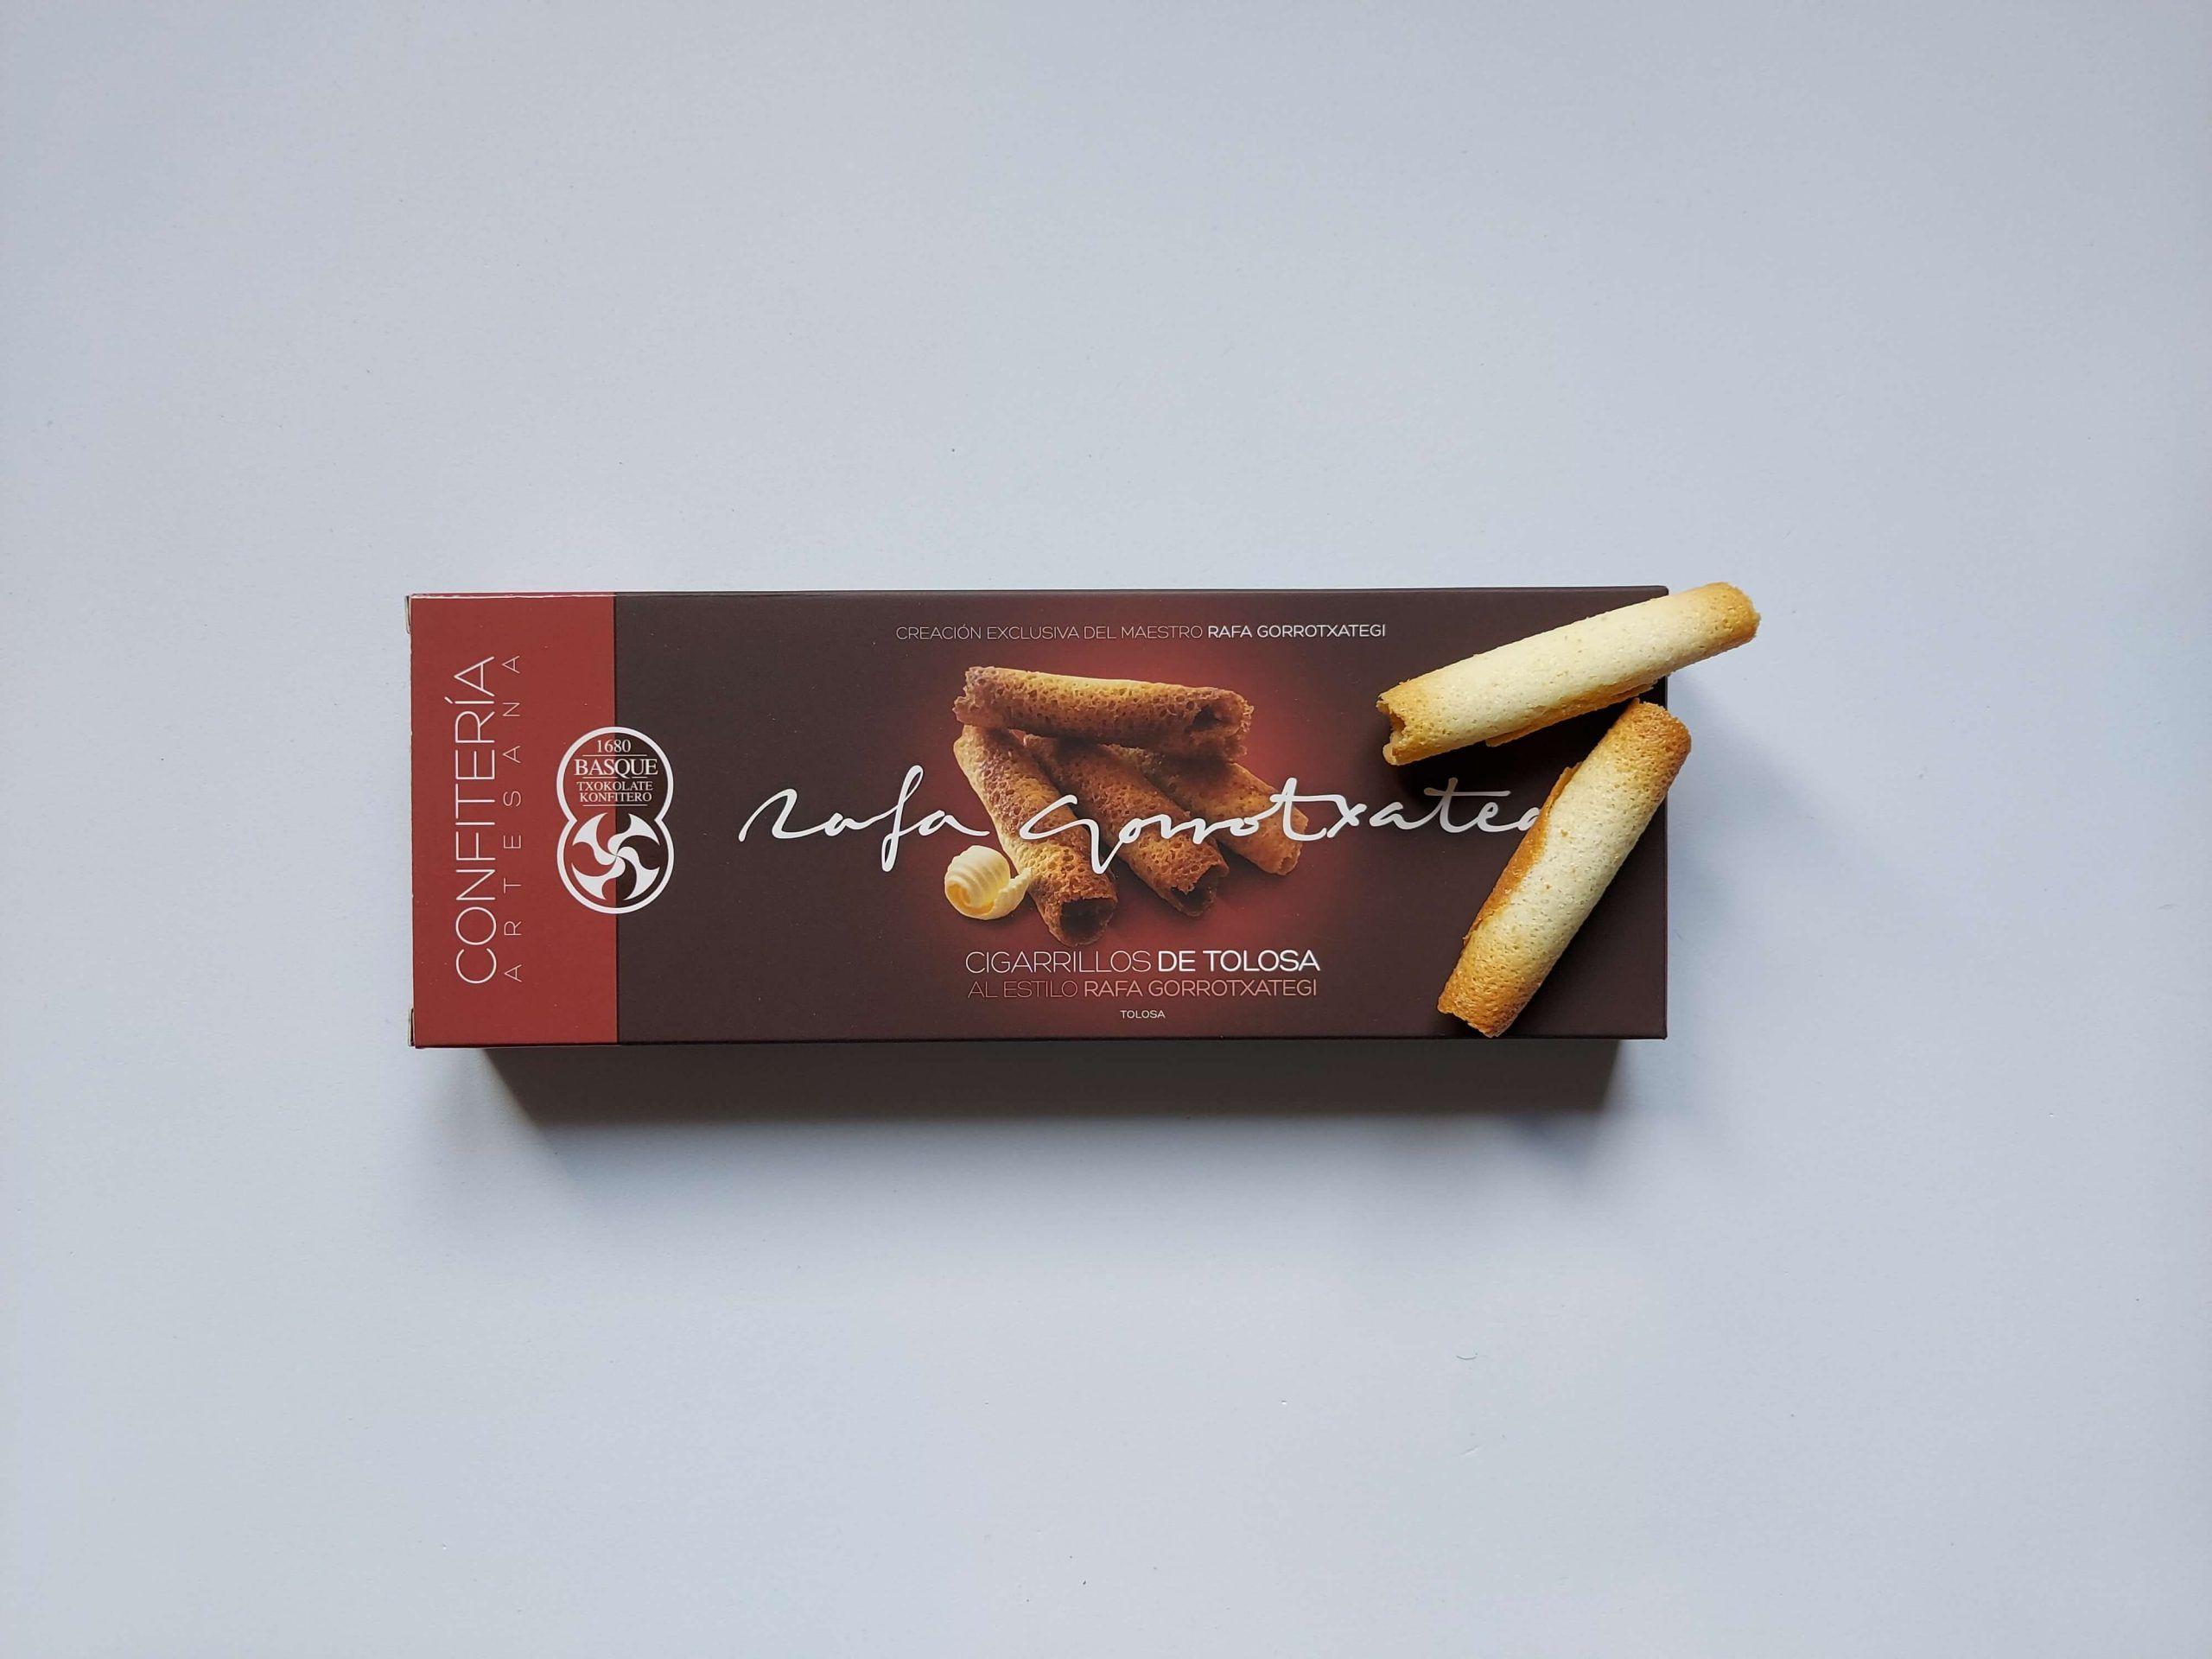 cigarrillos-gorrotxategi-2